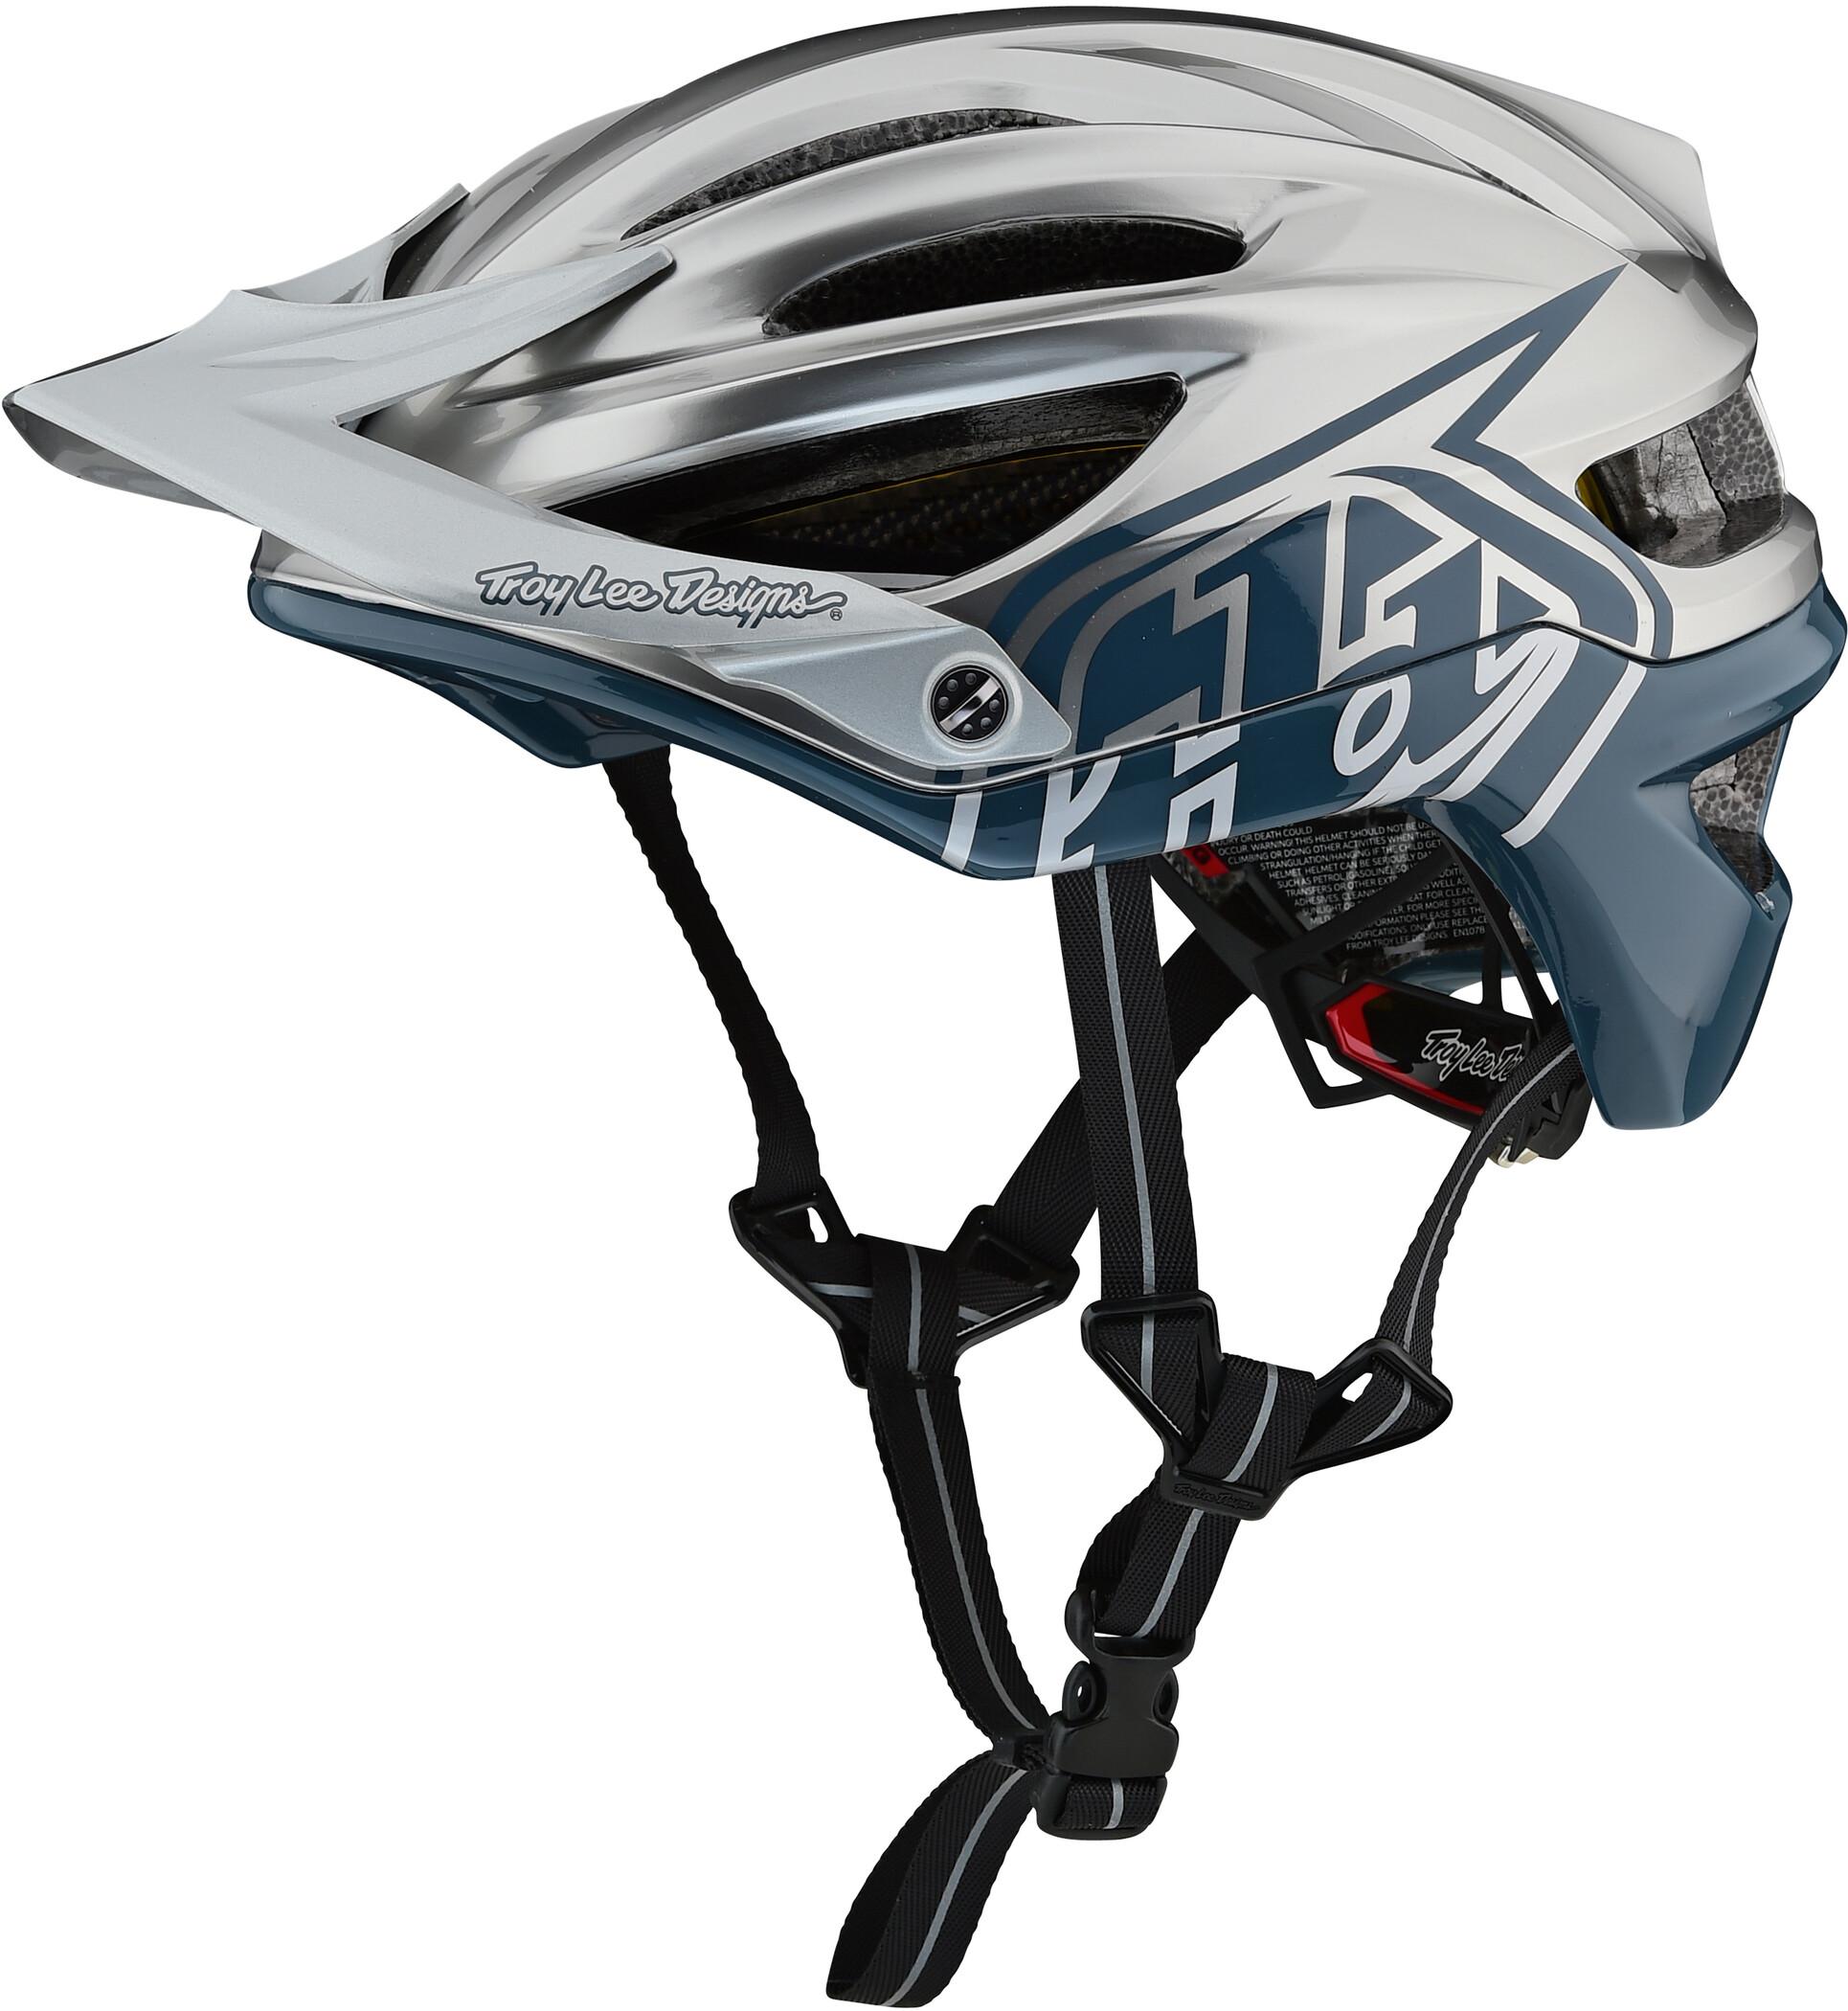 Troy Lee Designs A2 Decoy MIPS Cykelhjelm, air force blue/silver (2019) | Helmets